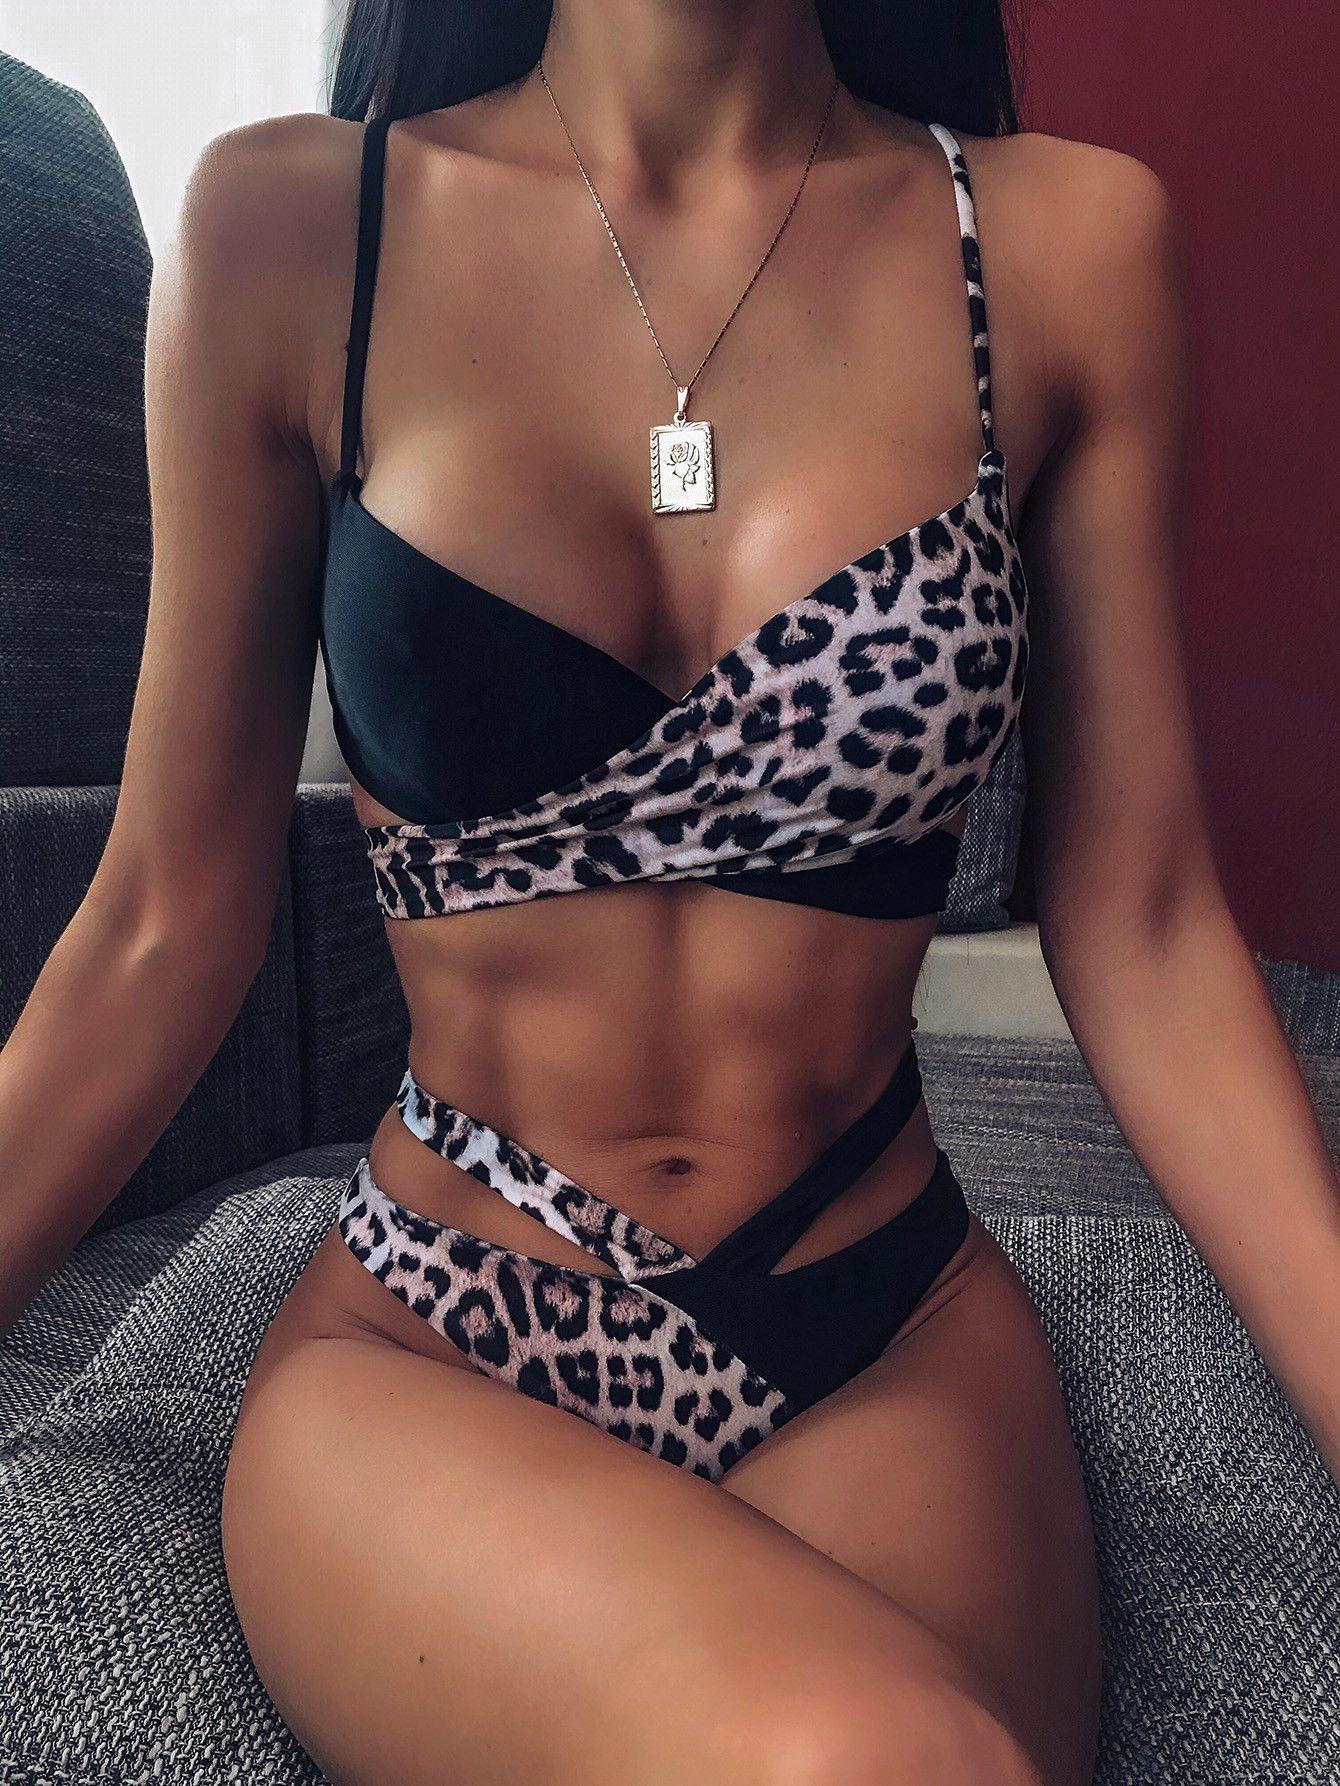 2020 Sexy Patchwork Mulheres cintura alta Bikini Swimsuit Swimwear Feminino Bandeau Thong Biquini brasileiro Bikini Set Terno Banhista